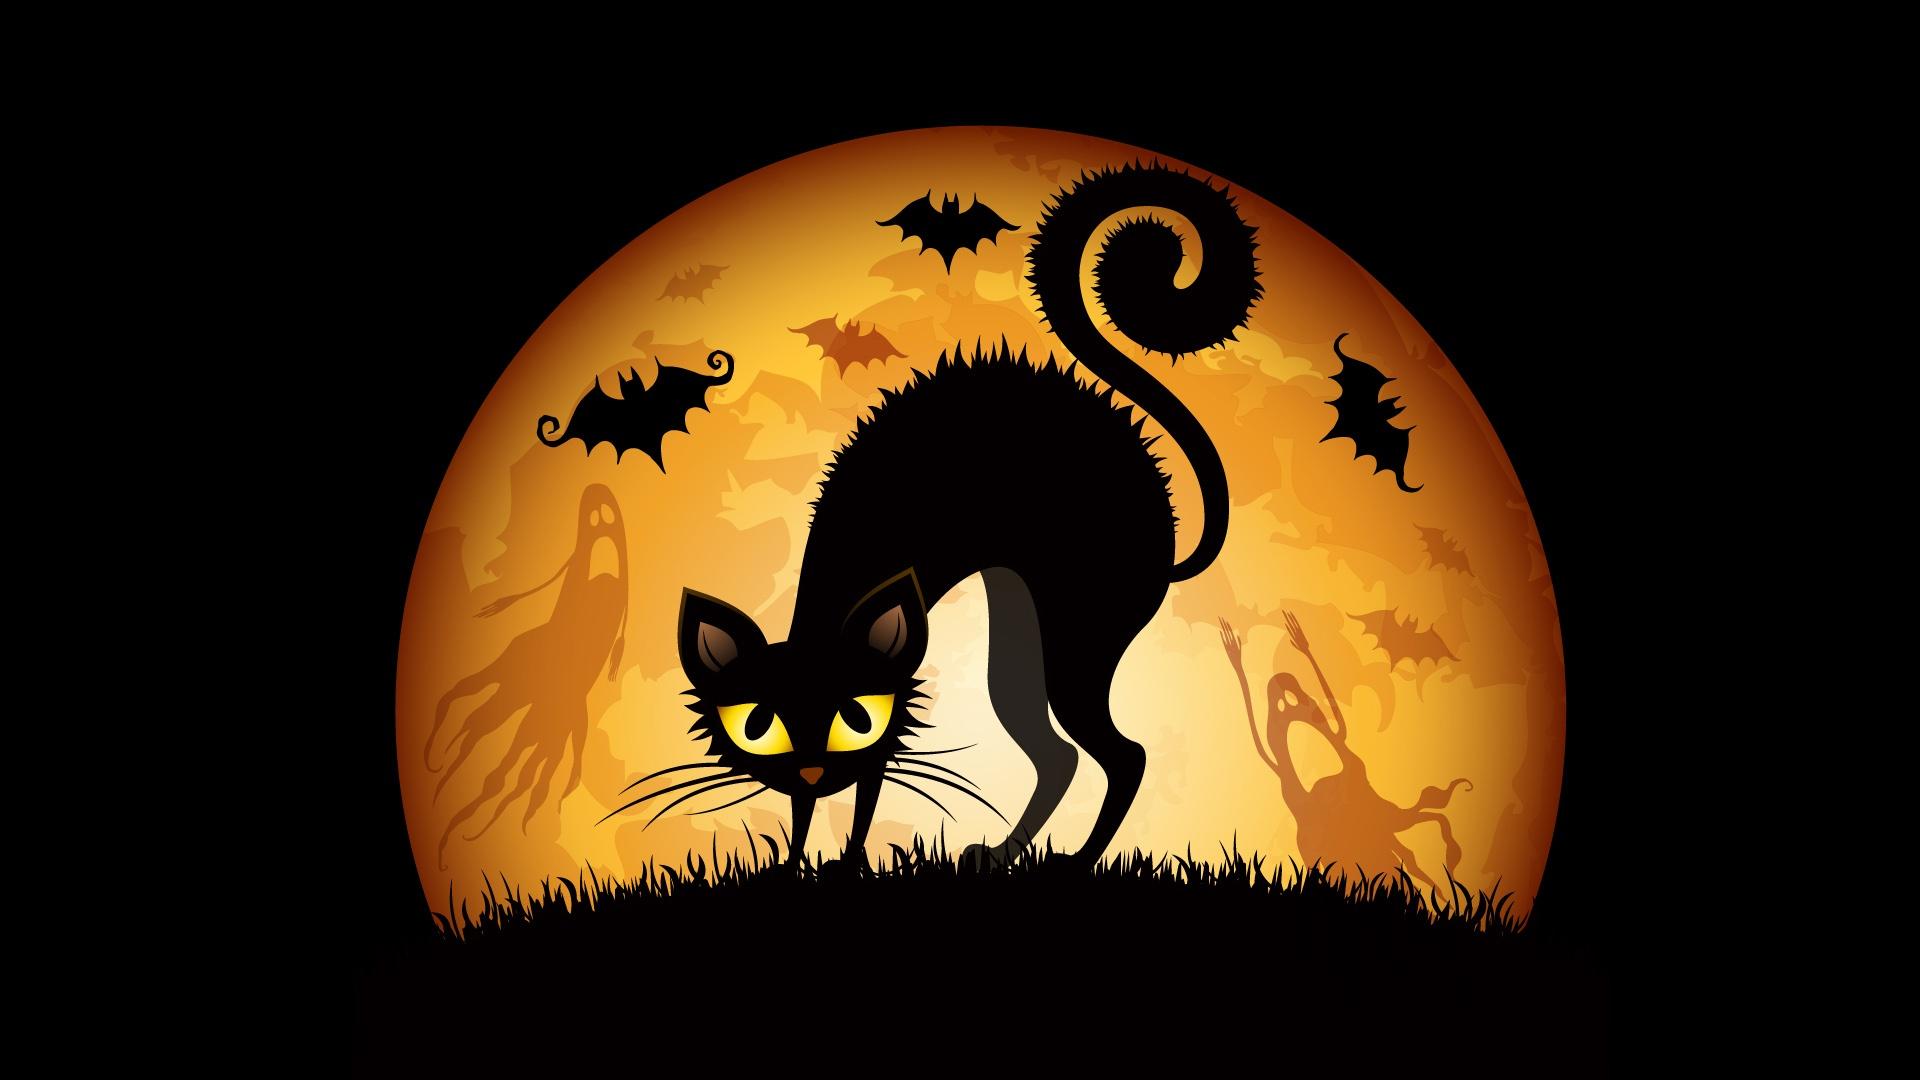 http://4.bp.blogspot.com/-z4hAKLFDccw/UG6EoemfQNI/AAAAAAAALX4/9eNIFhCIfG4/s0/halloween-cats-bats-1920x1080.jpg